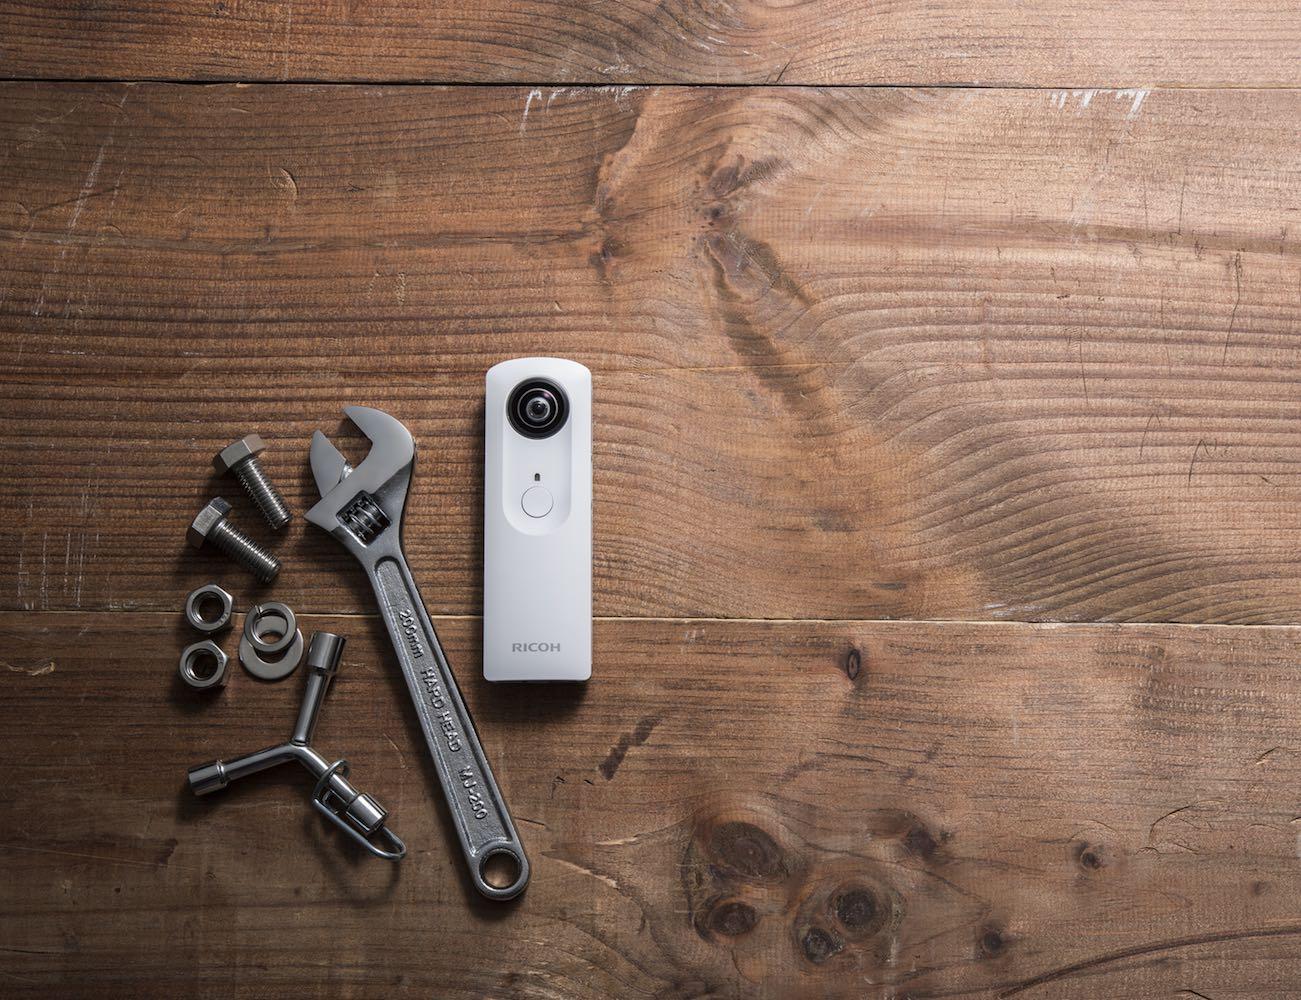 Ricoh Theta S – 360-Degree Spherical Digital Camera